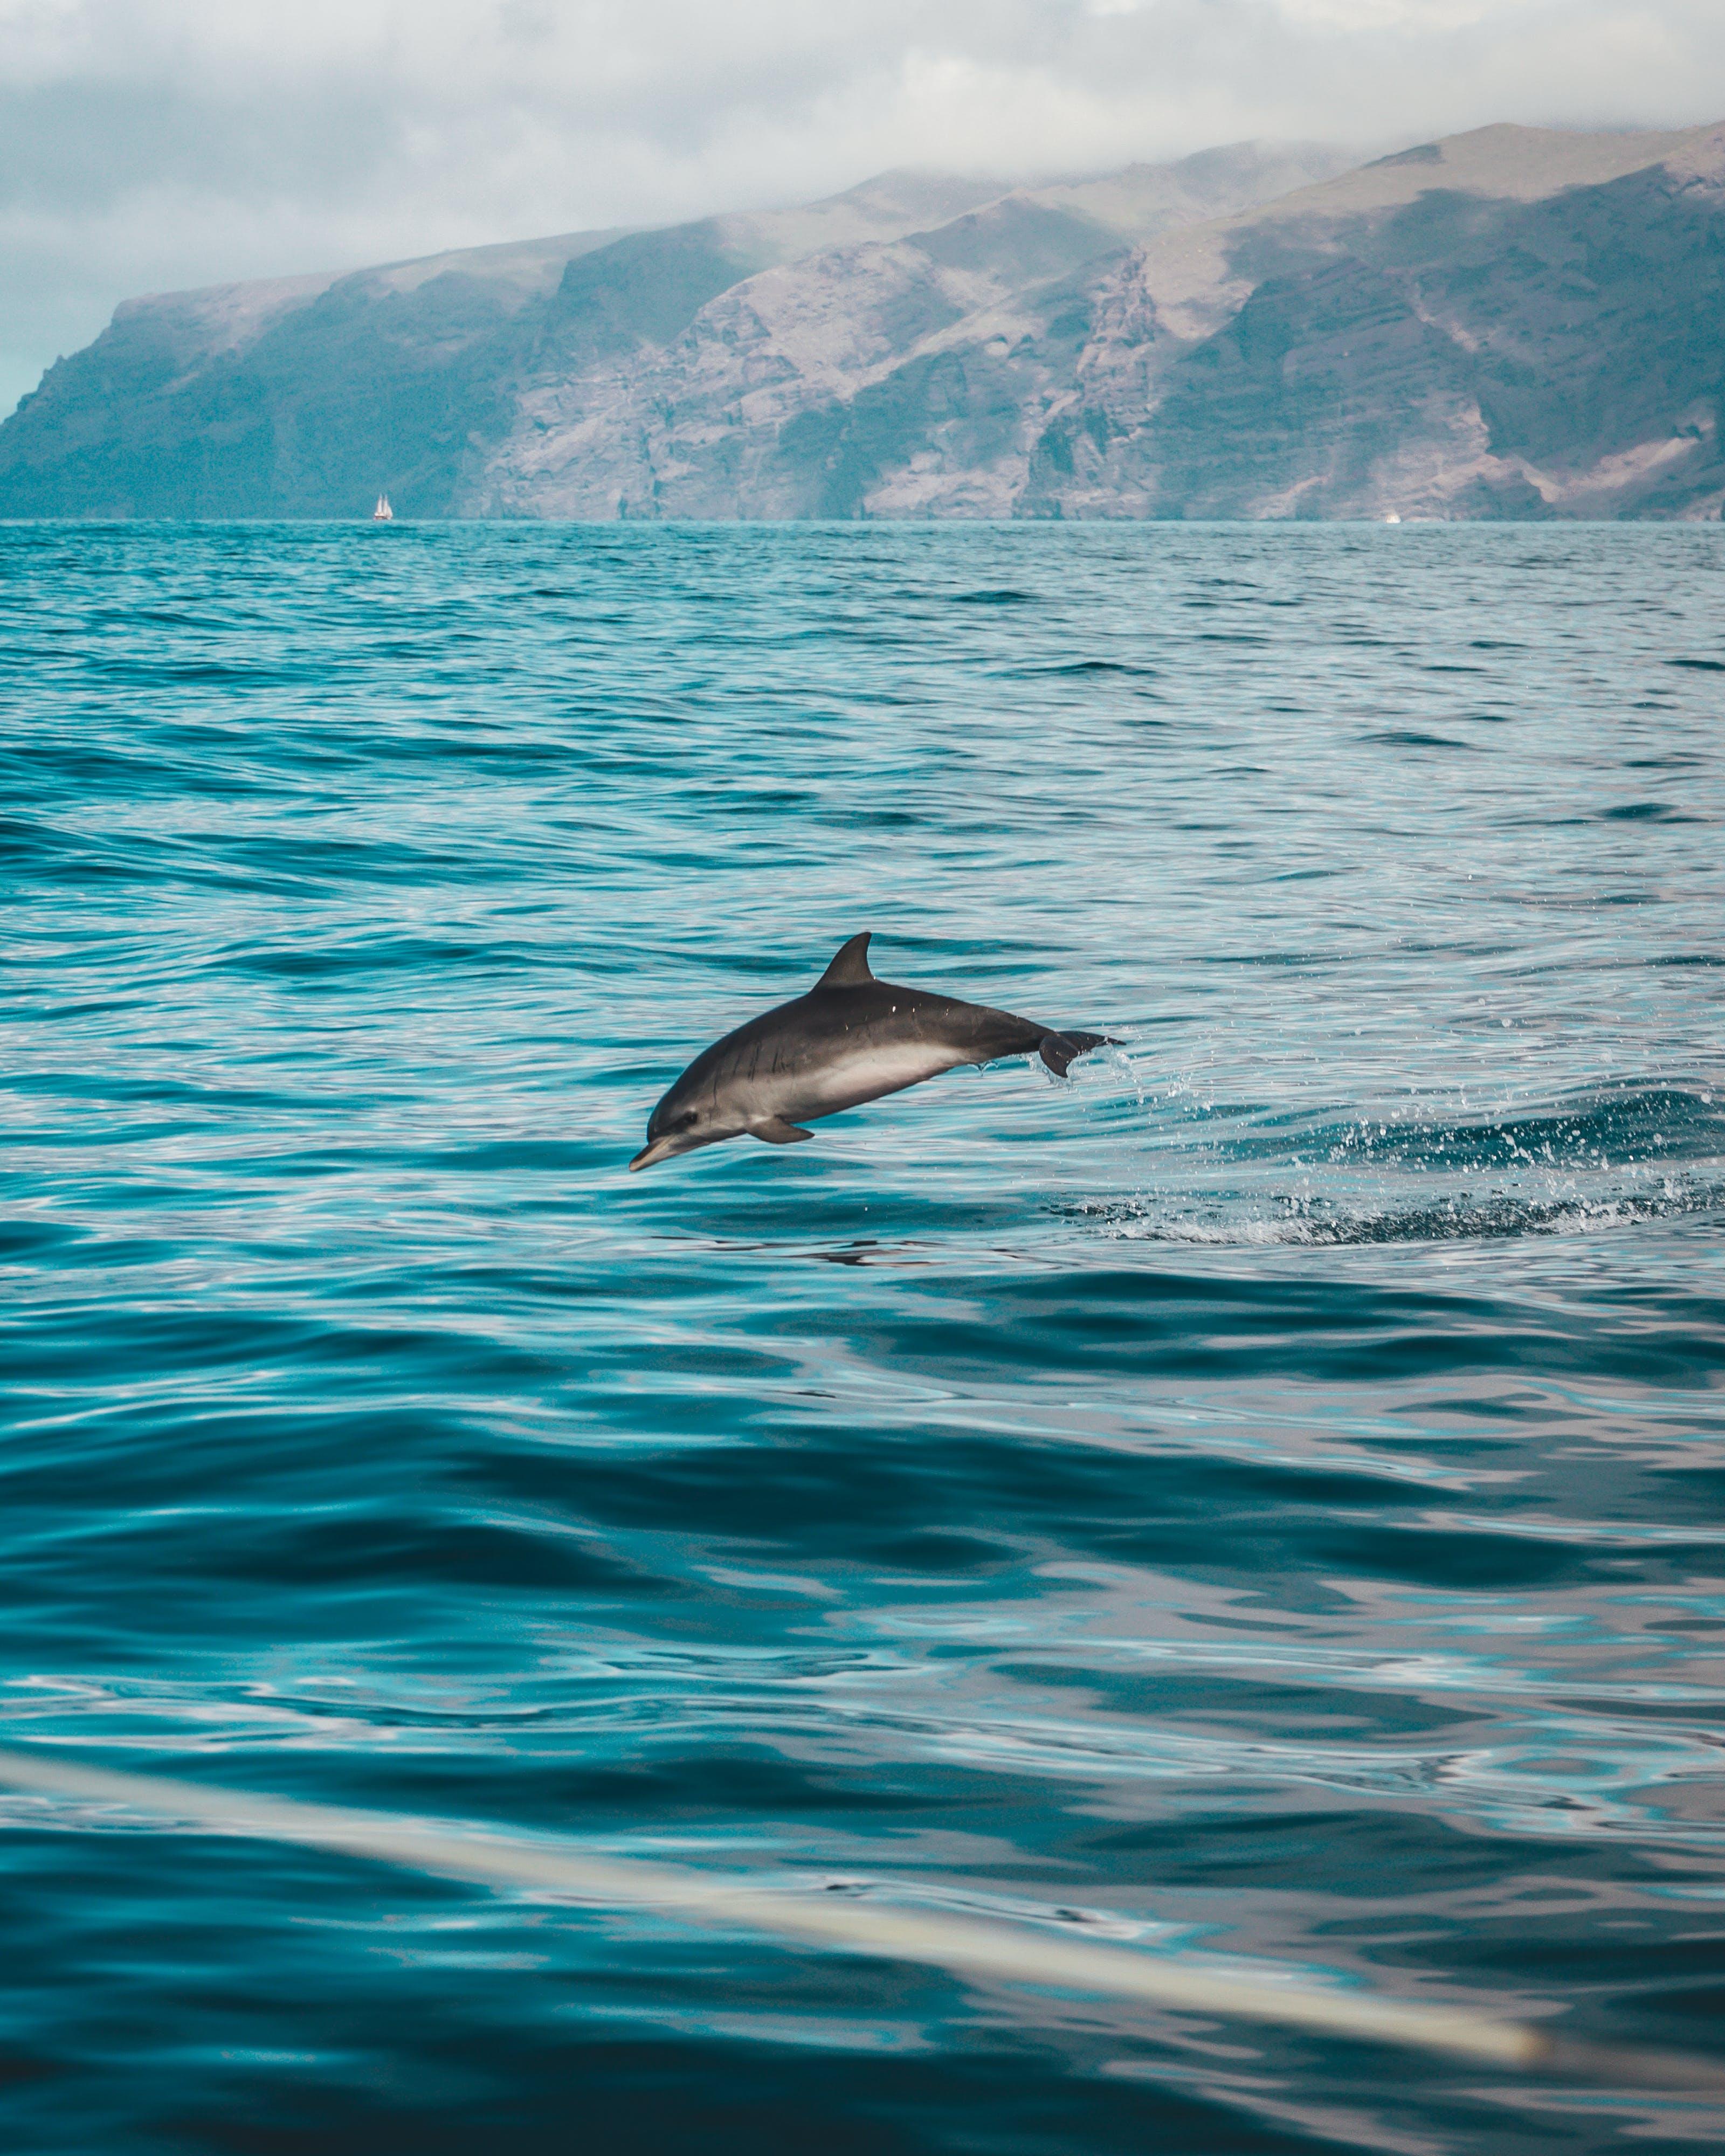 Fotos de stock gratuitas de agua, animal, buceando, delfín